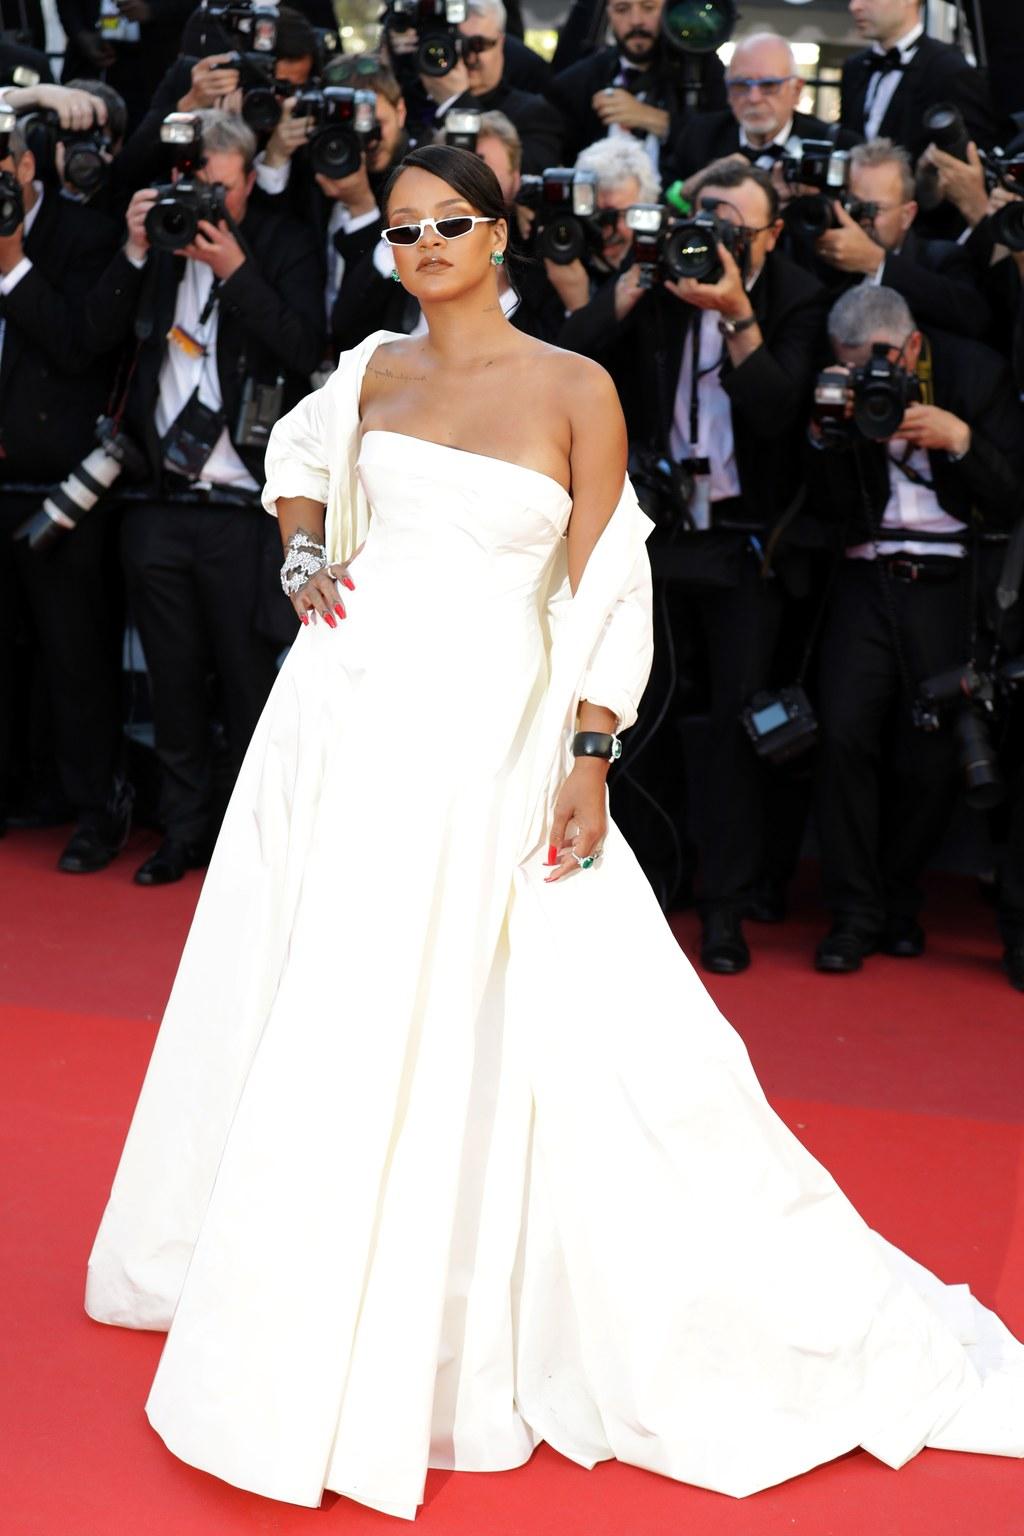 Rihanna at Cannes. Photo by Giulio Origlia